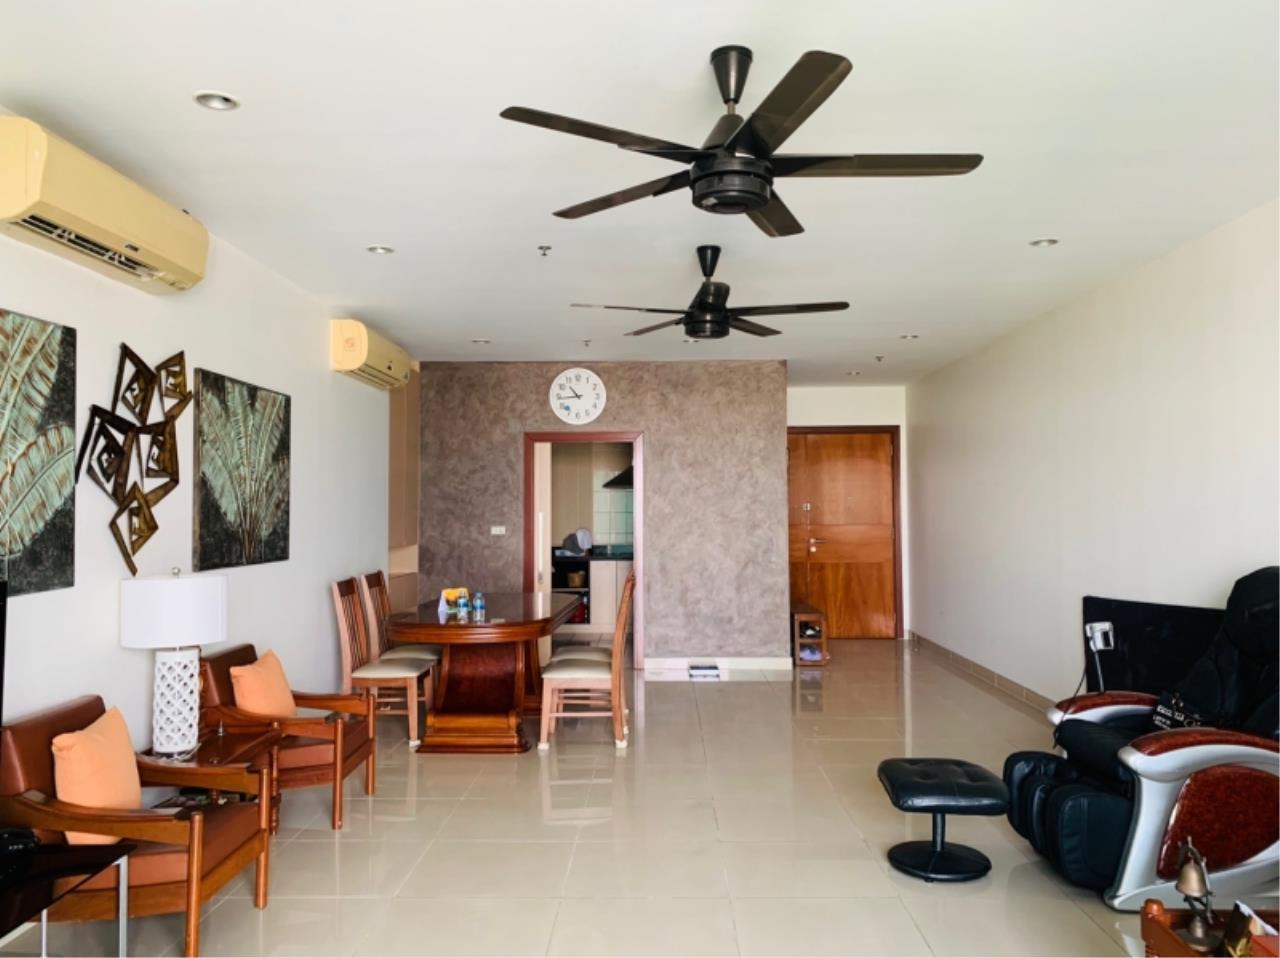 Century21 Skylux Agency's The Star Estate @ Narathiwas / Condo For Rent / 3 Bedroom / 165.09 SQM / BTS Chong Nonsi / Bangkok 1